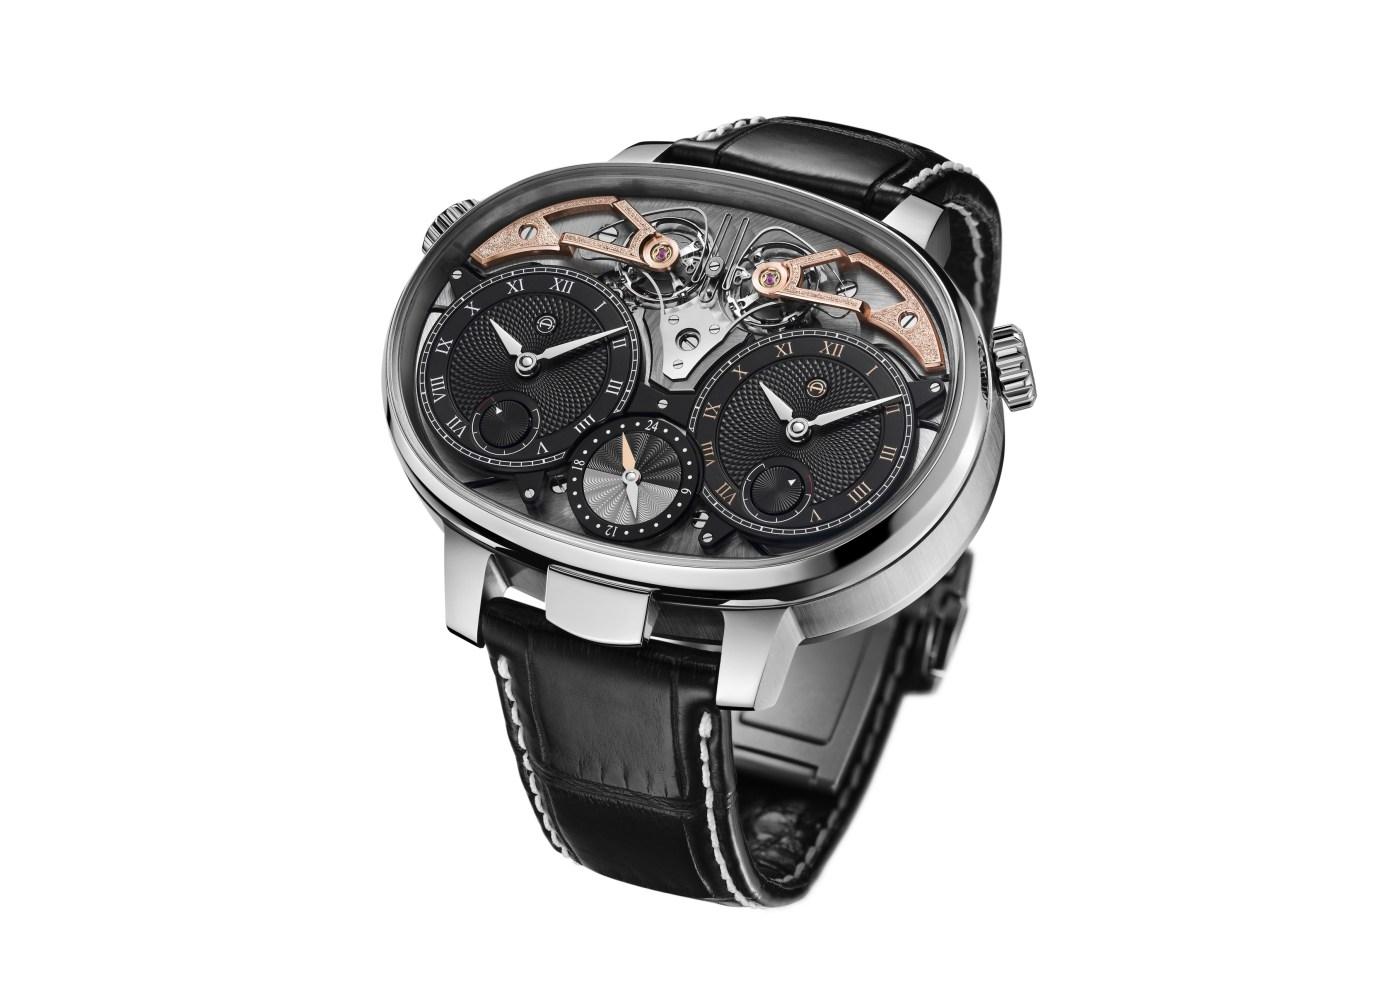 Armin Strom Dual Time Resonance Three-Quarter angle